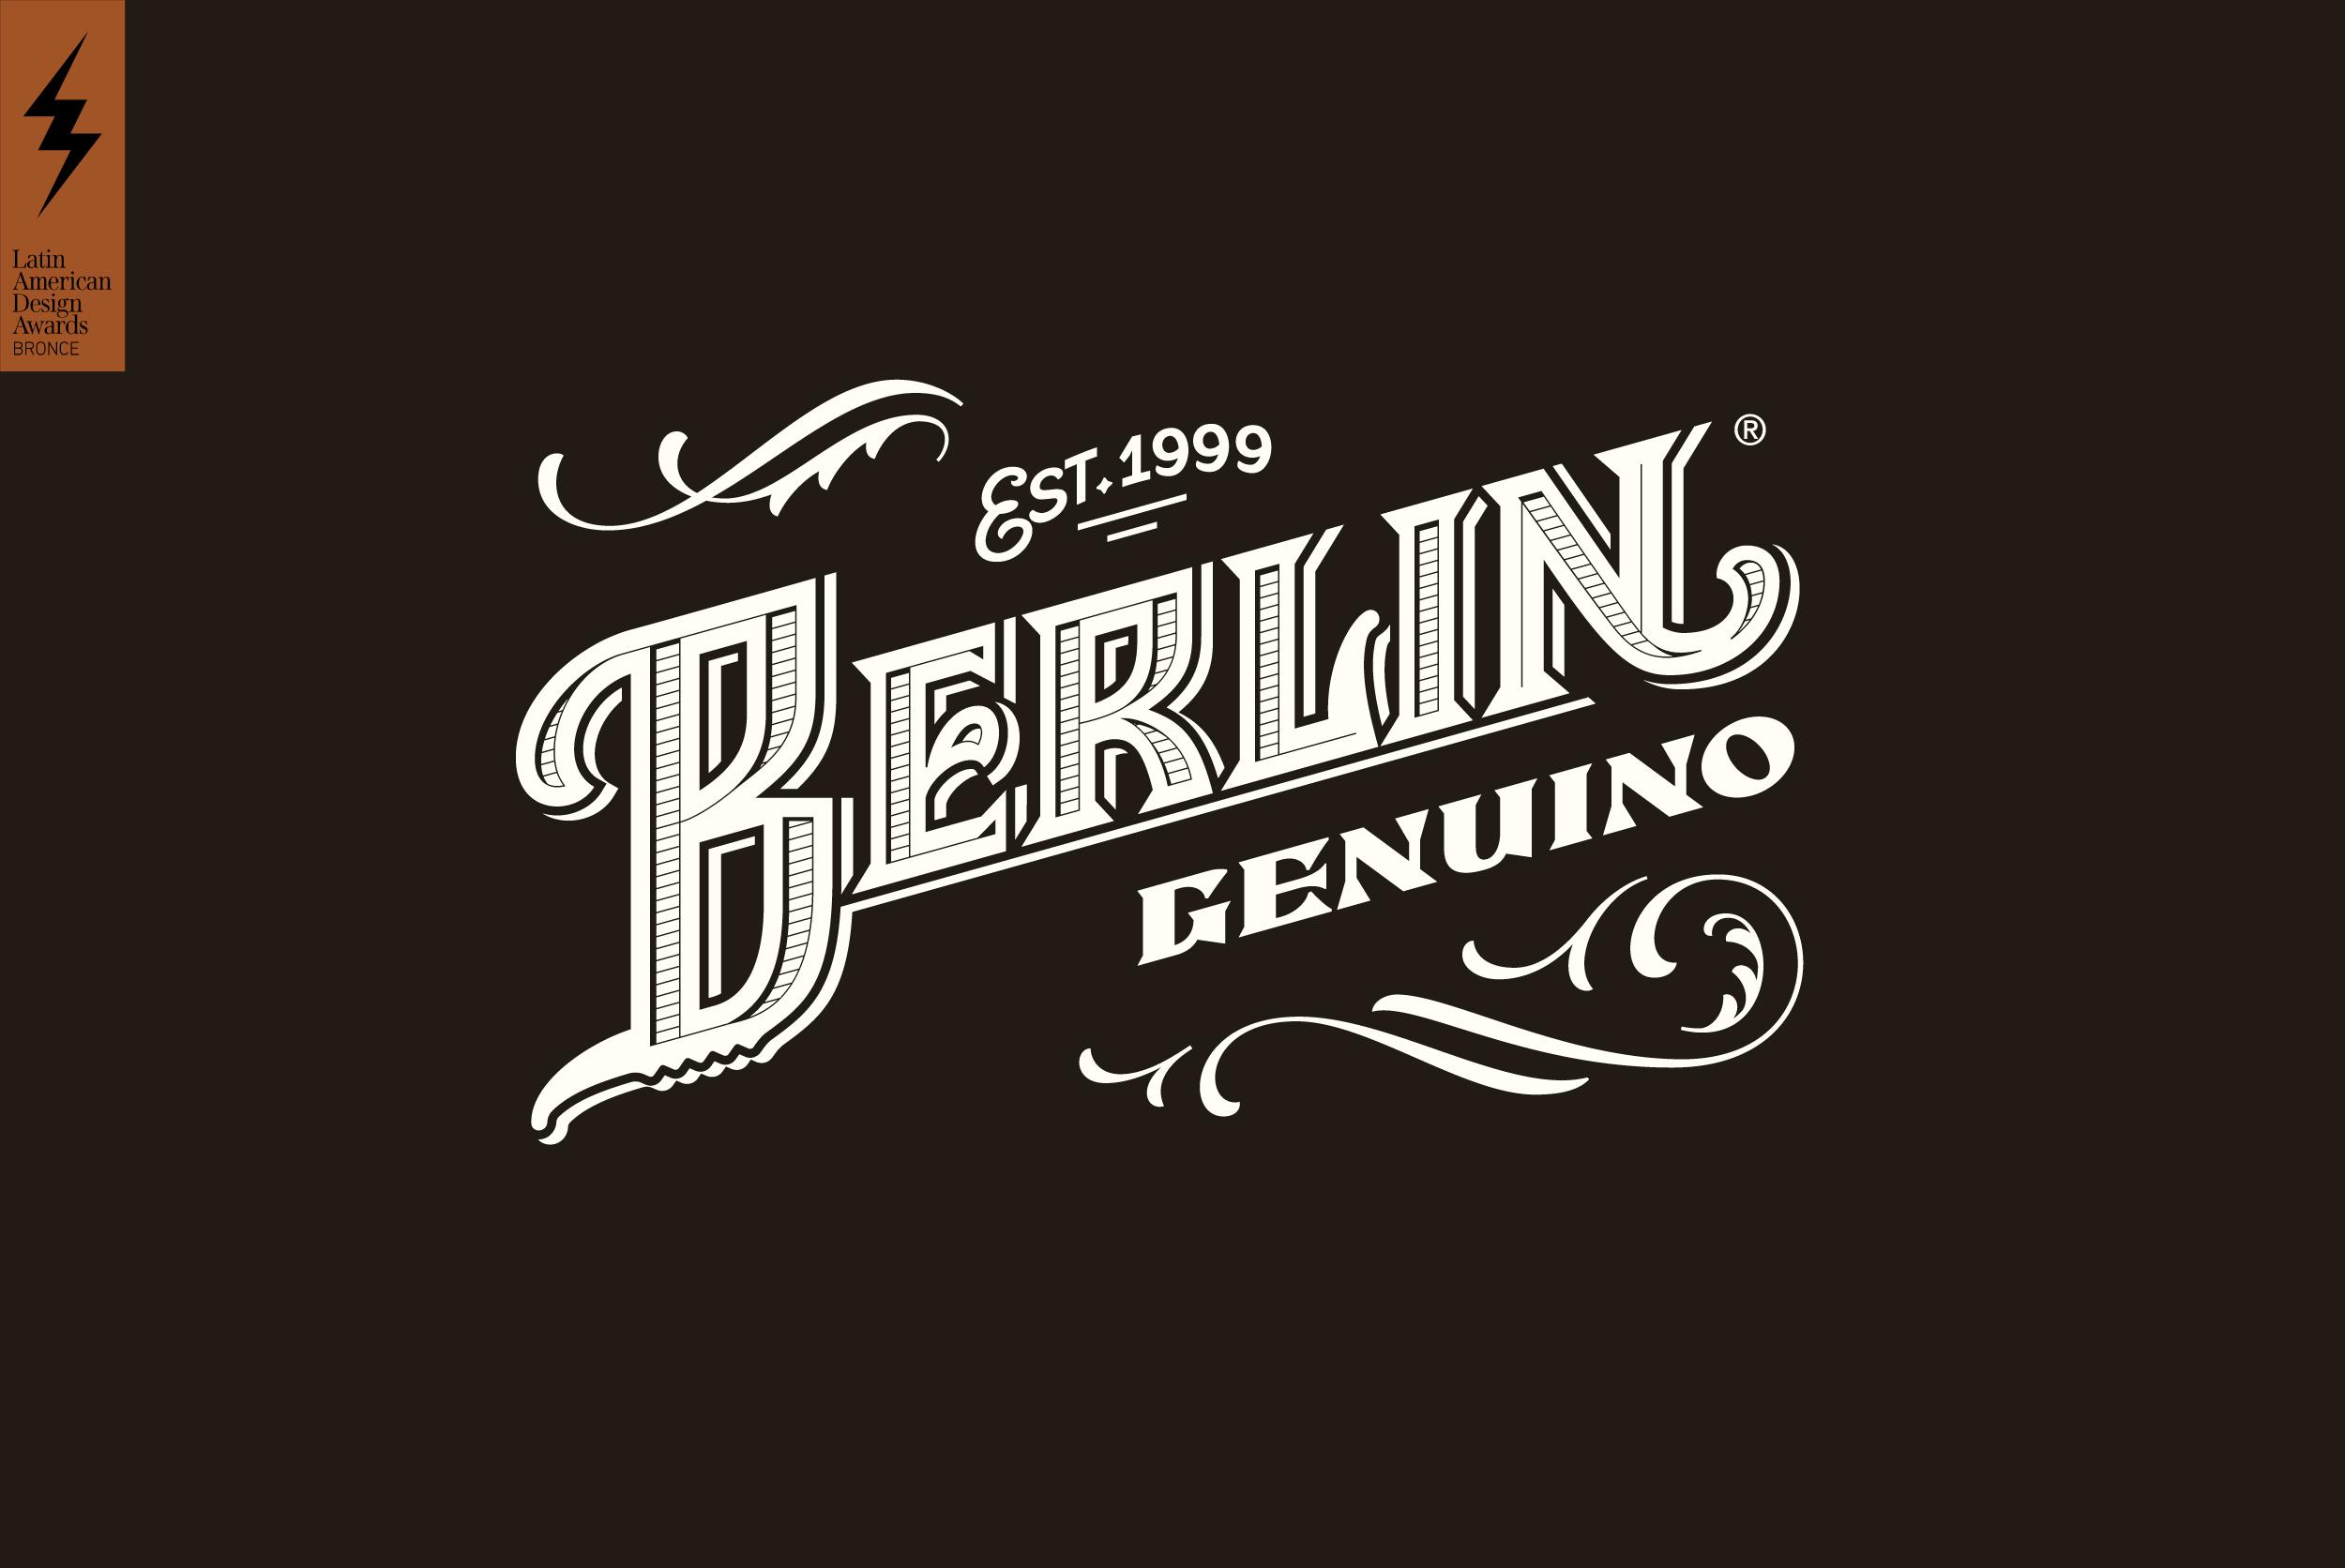 BERLIN-GENUINO_ID+Packaging_Yanina-Arabena_Guillermo-Vizzari_8_3.jpg